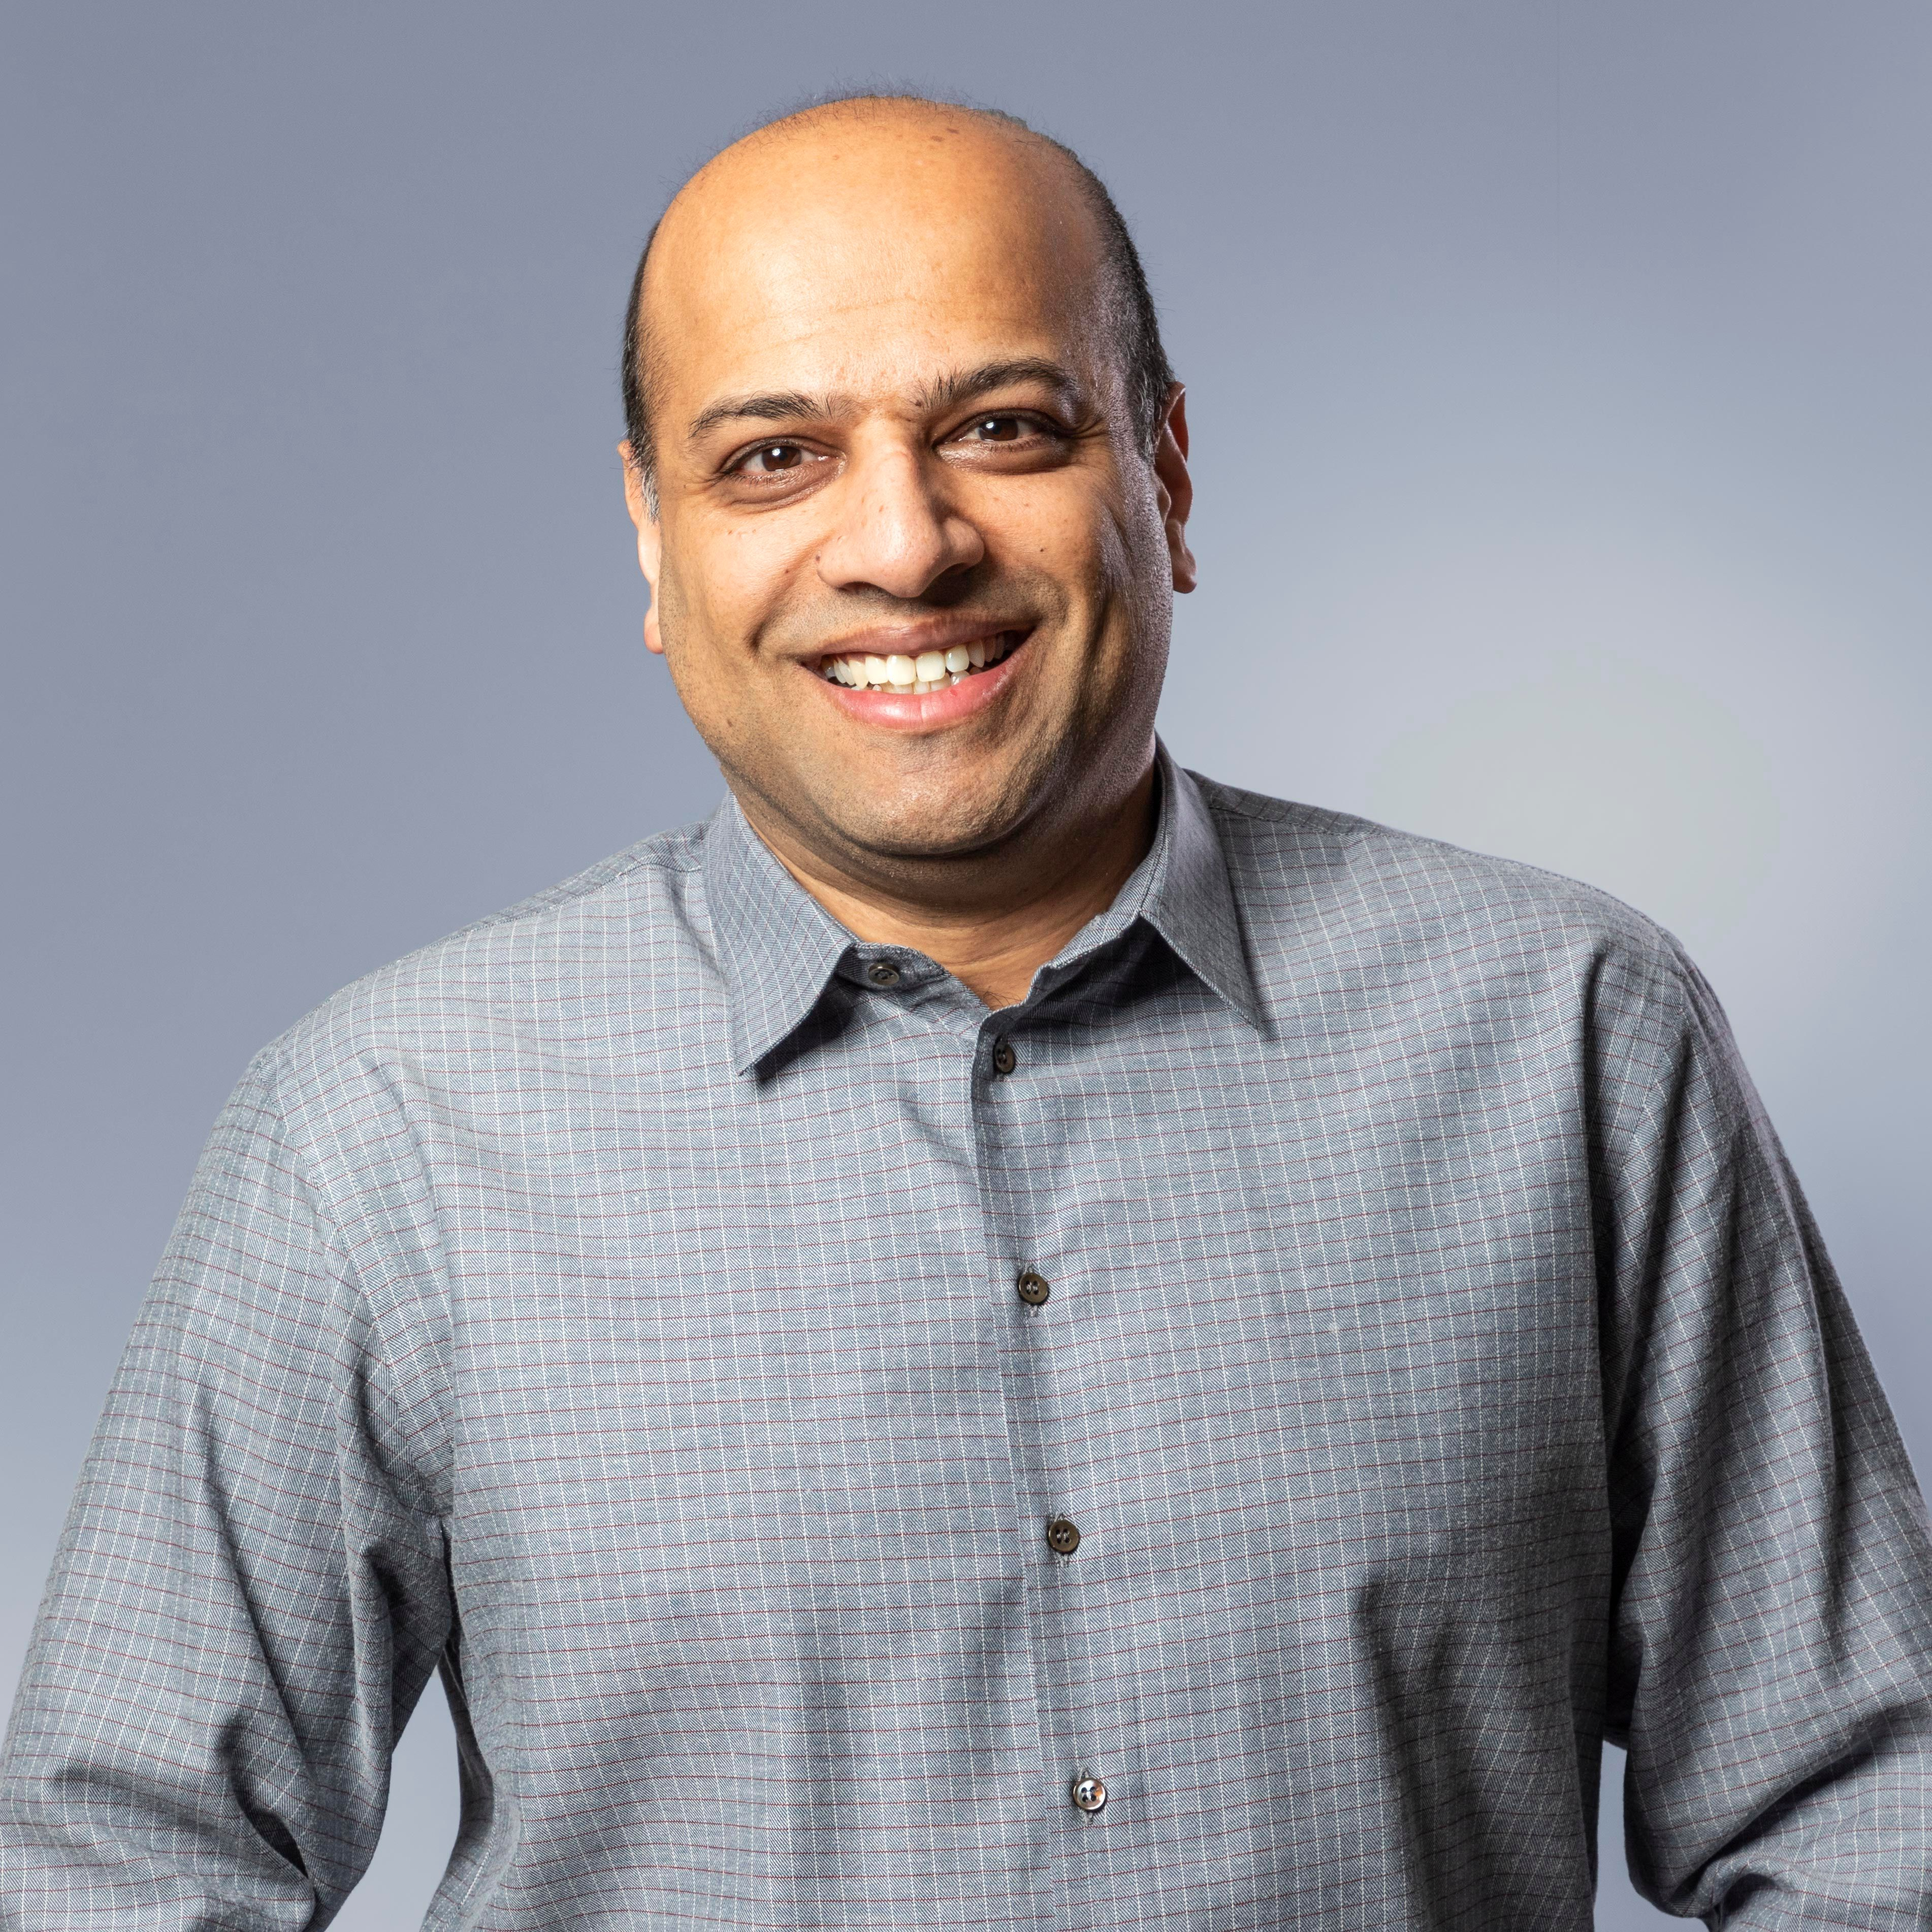 Sujal Patel